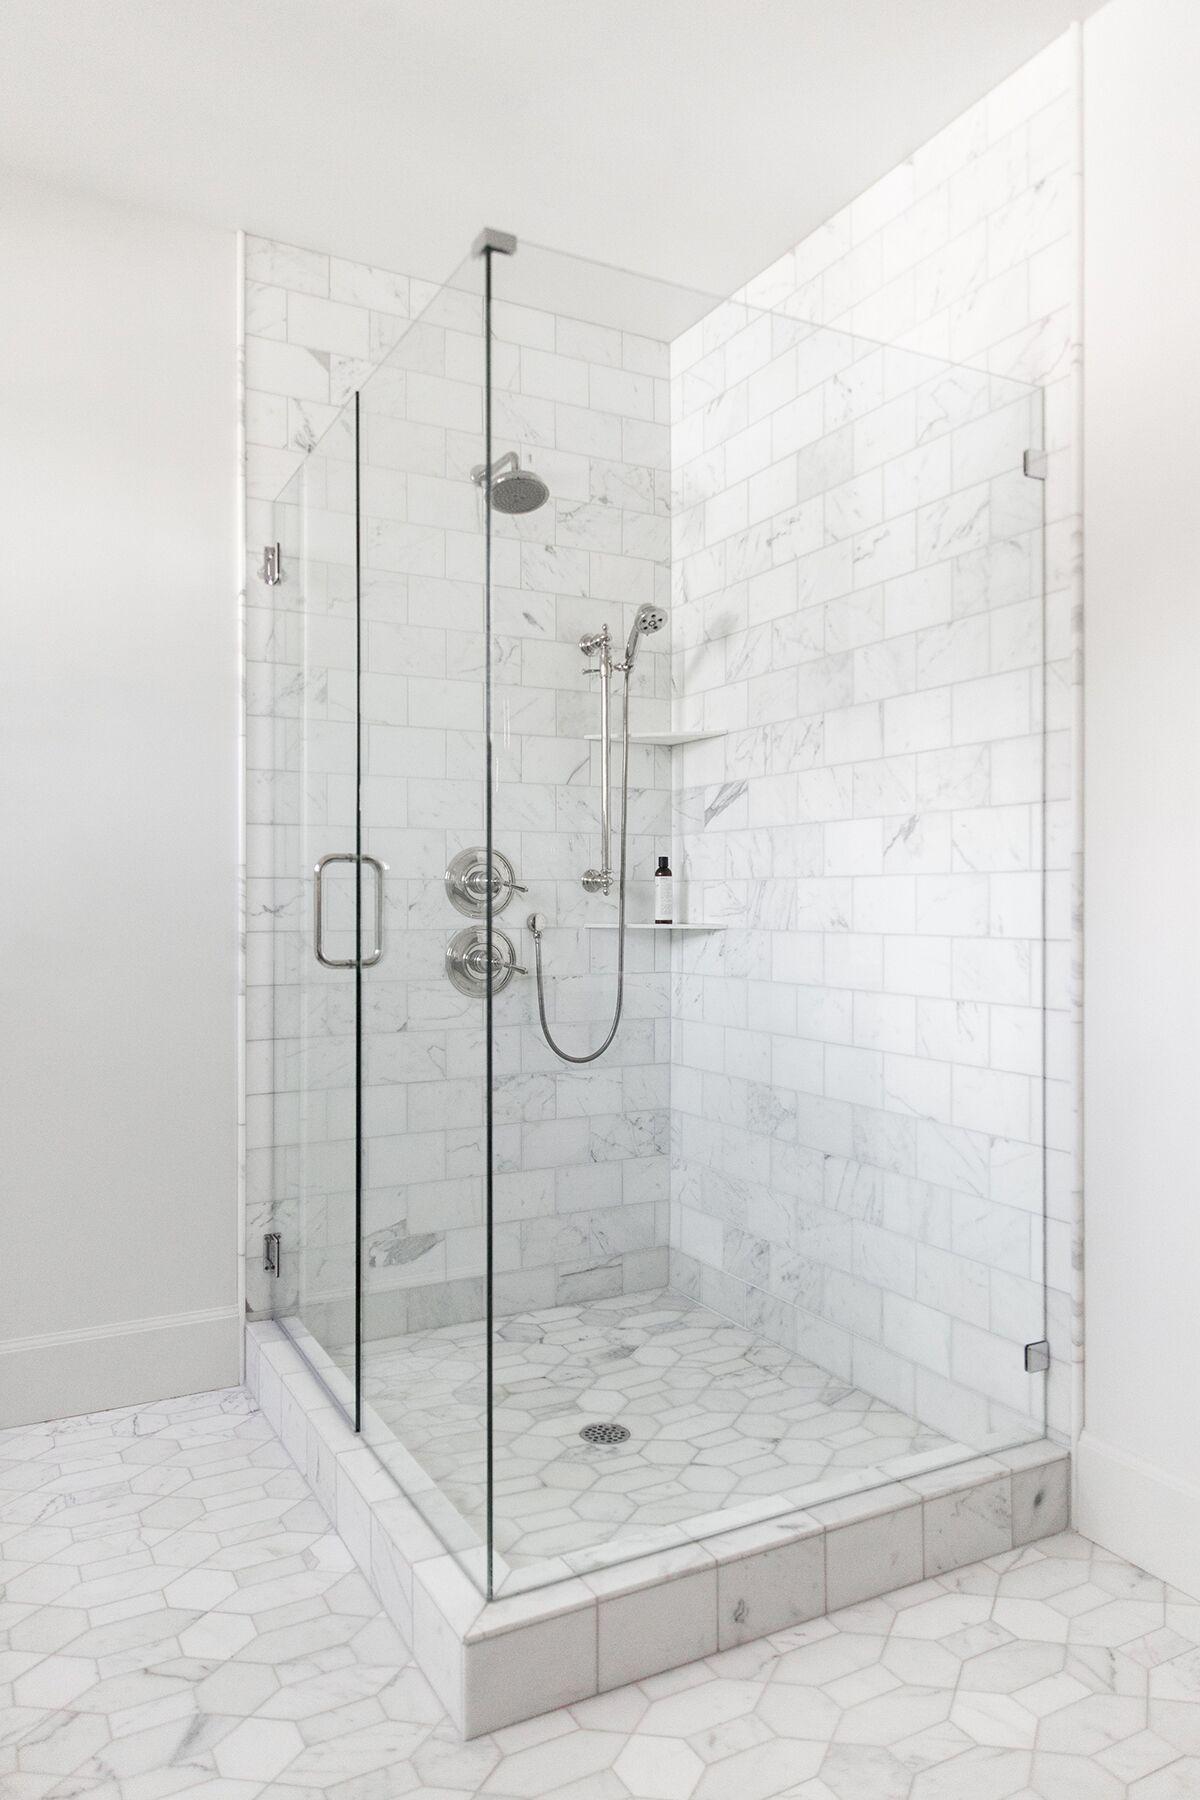 Stringham Project Photo Tour Pt 1 Bathroom Interior Design